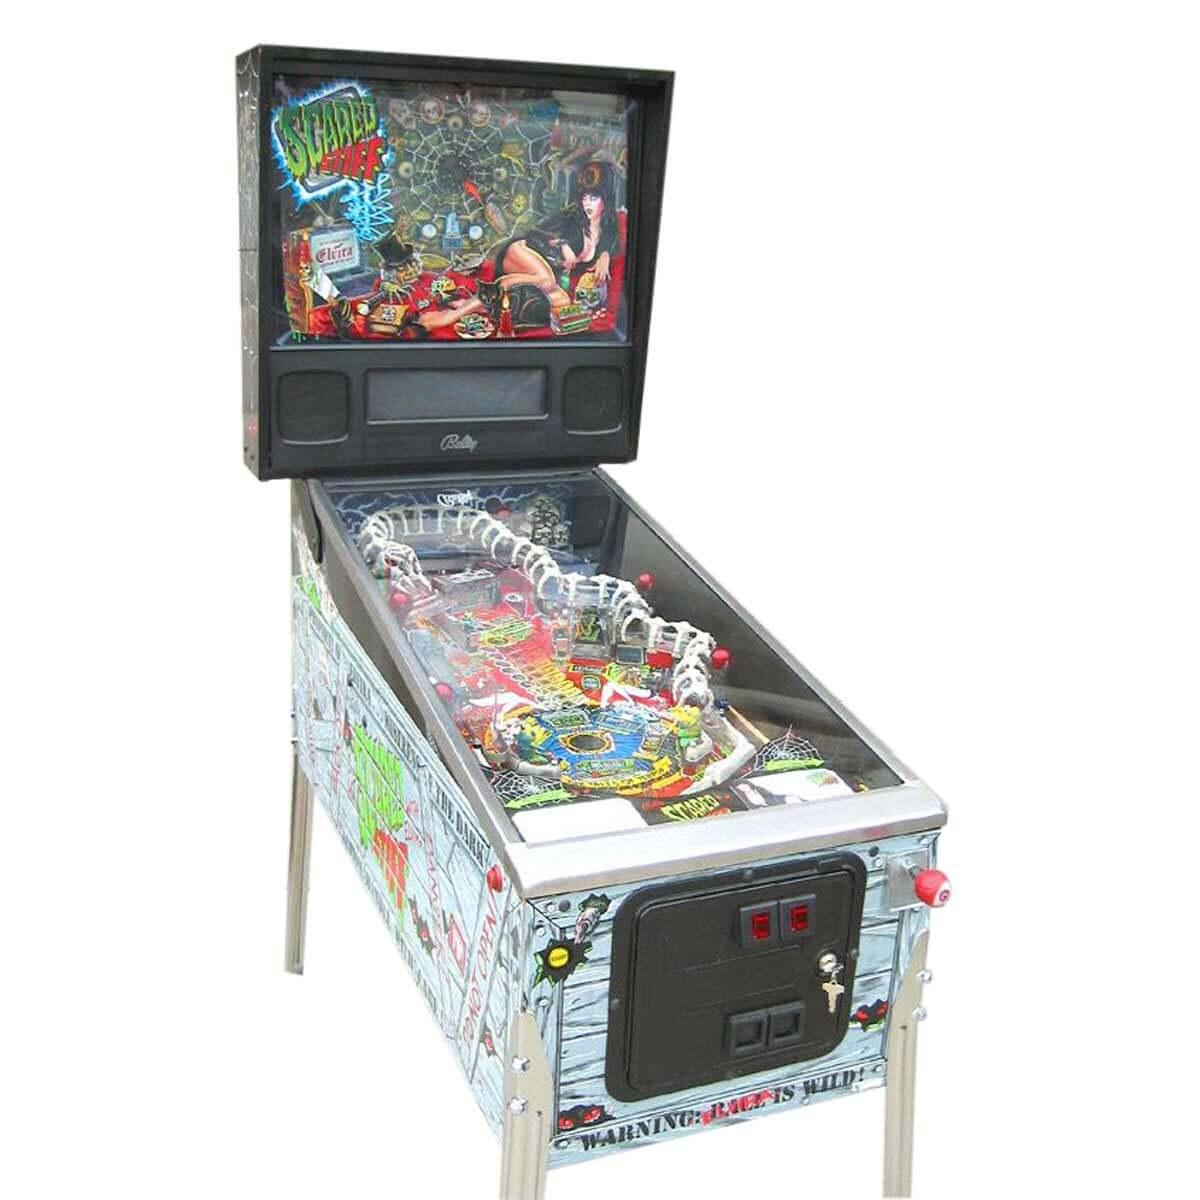 Buy Scared Stiff Pinball Machine By Bally Online At 9999